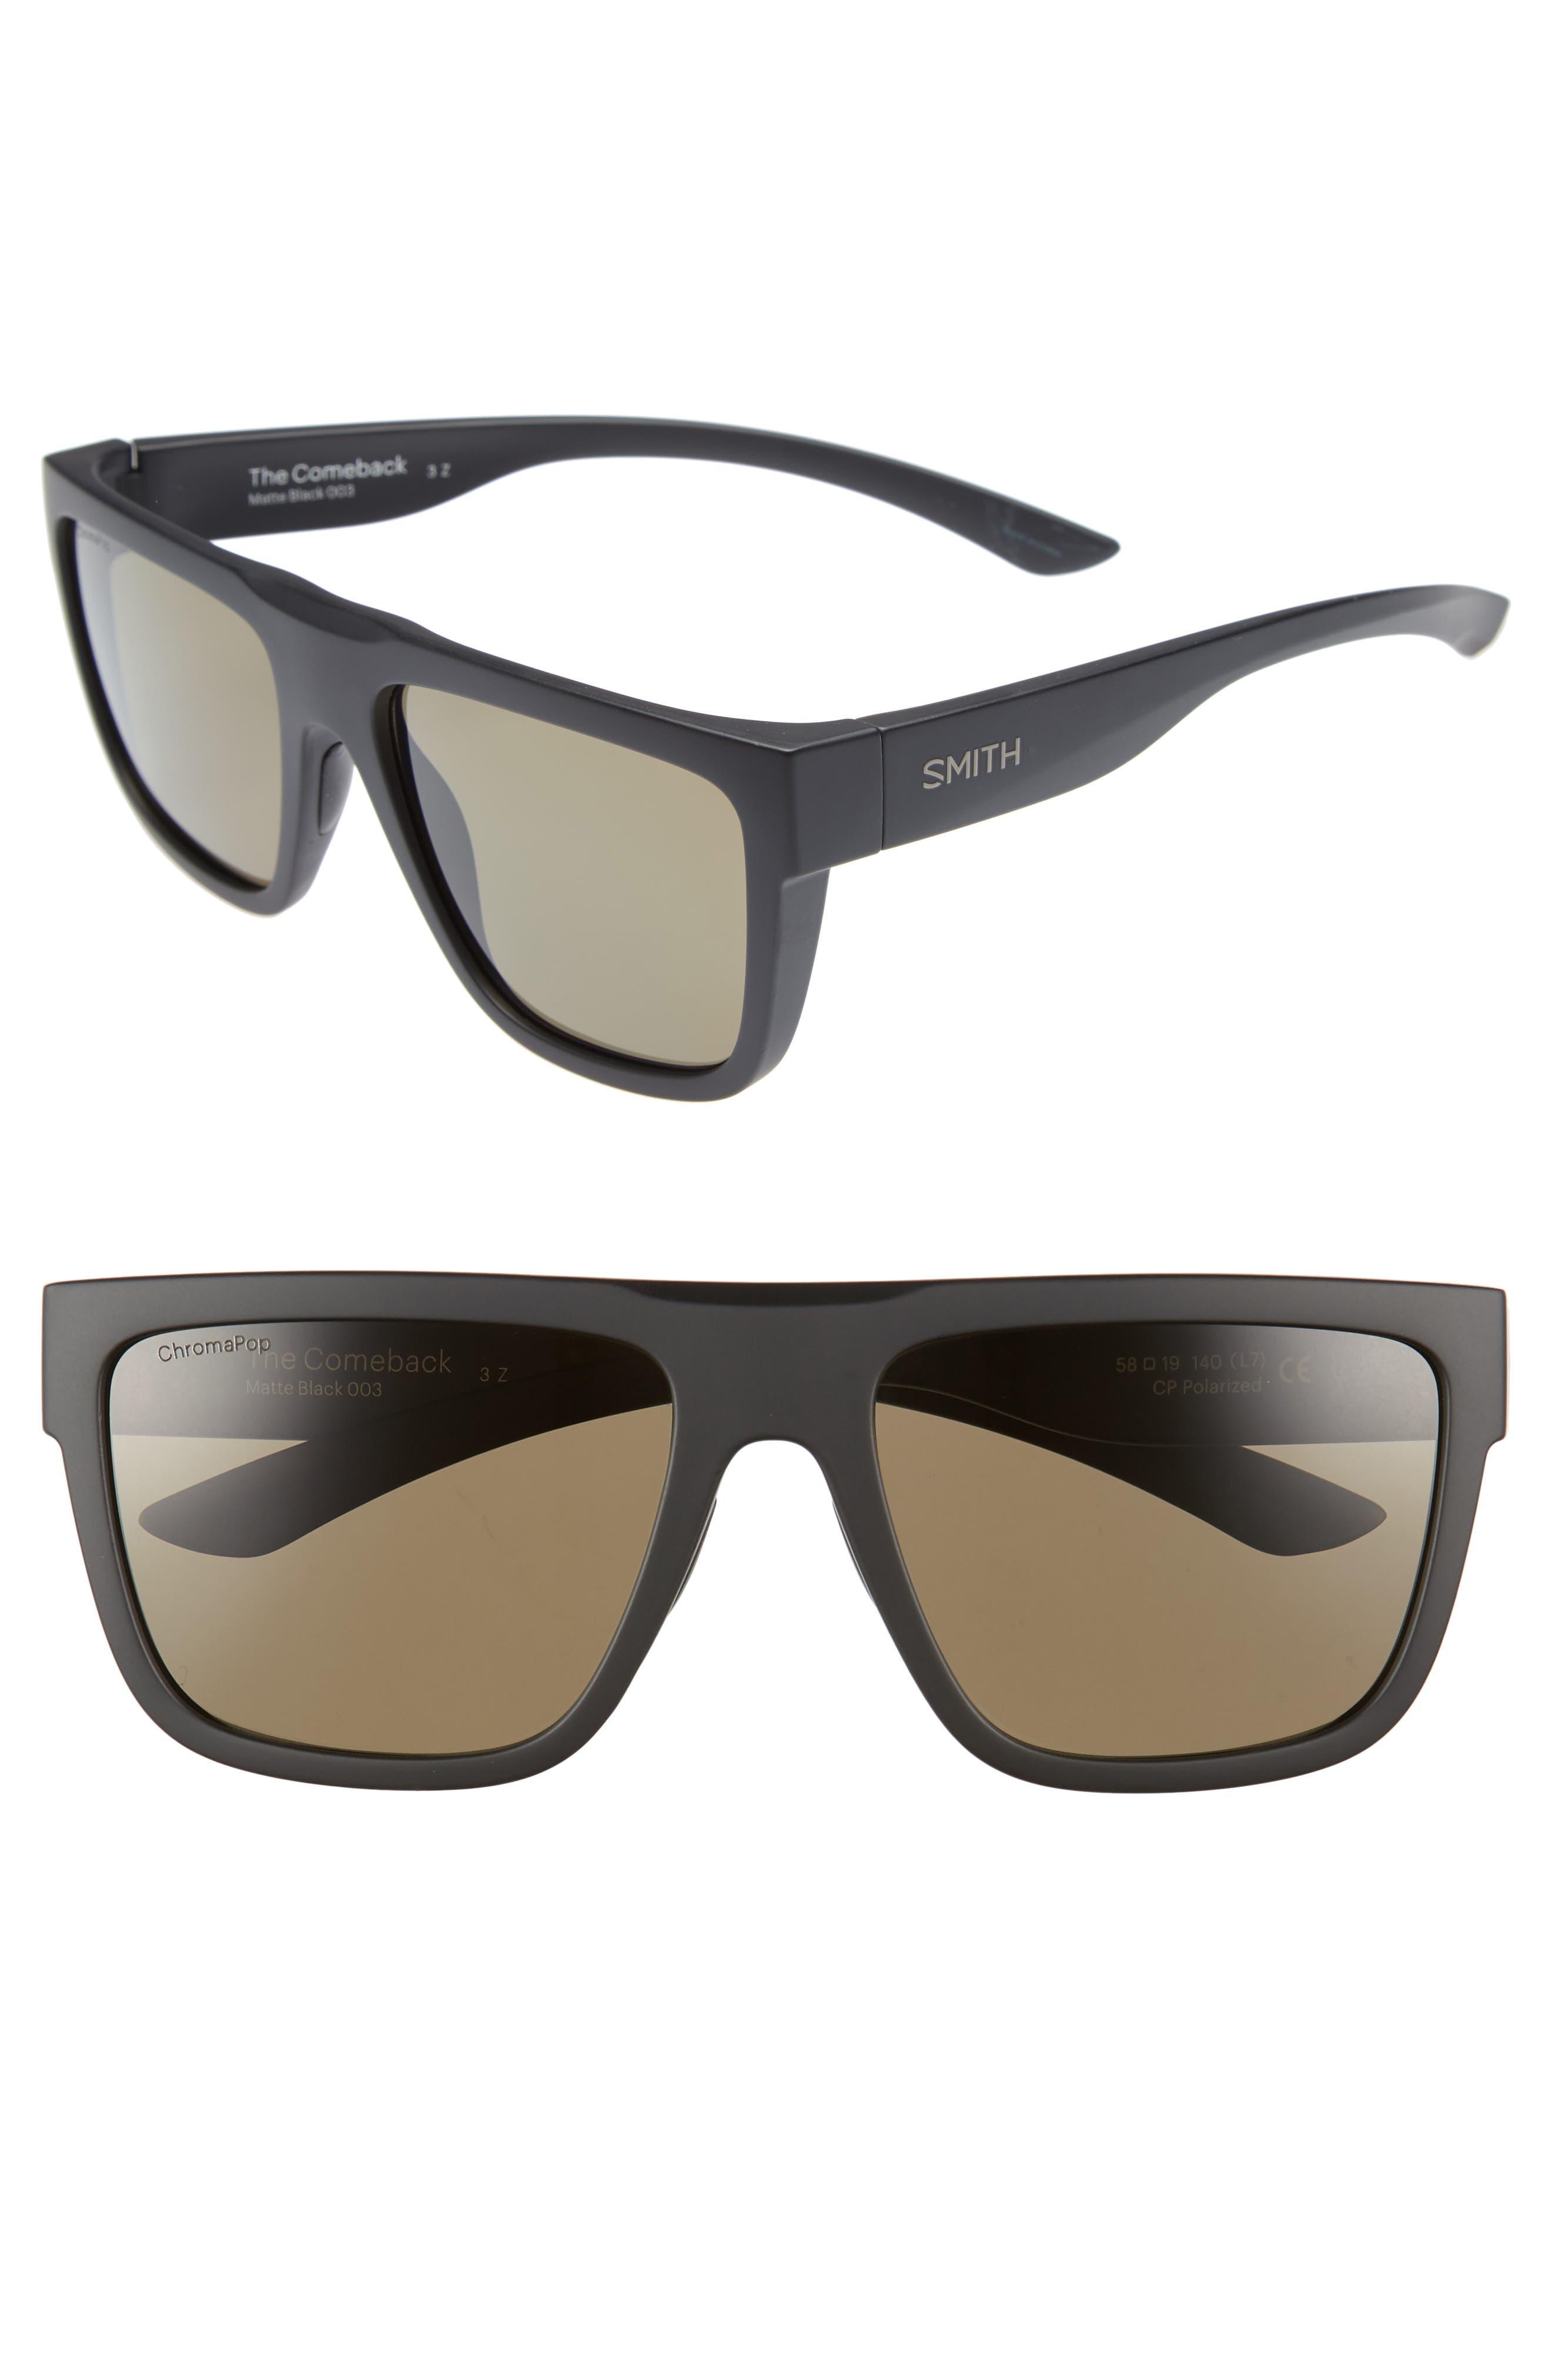 49f2143b18 Smith sunglasses nordstrom jpg 480x730 Crusader chromapop